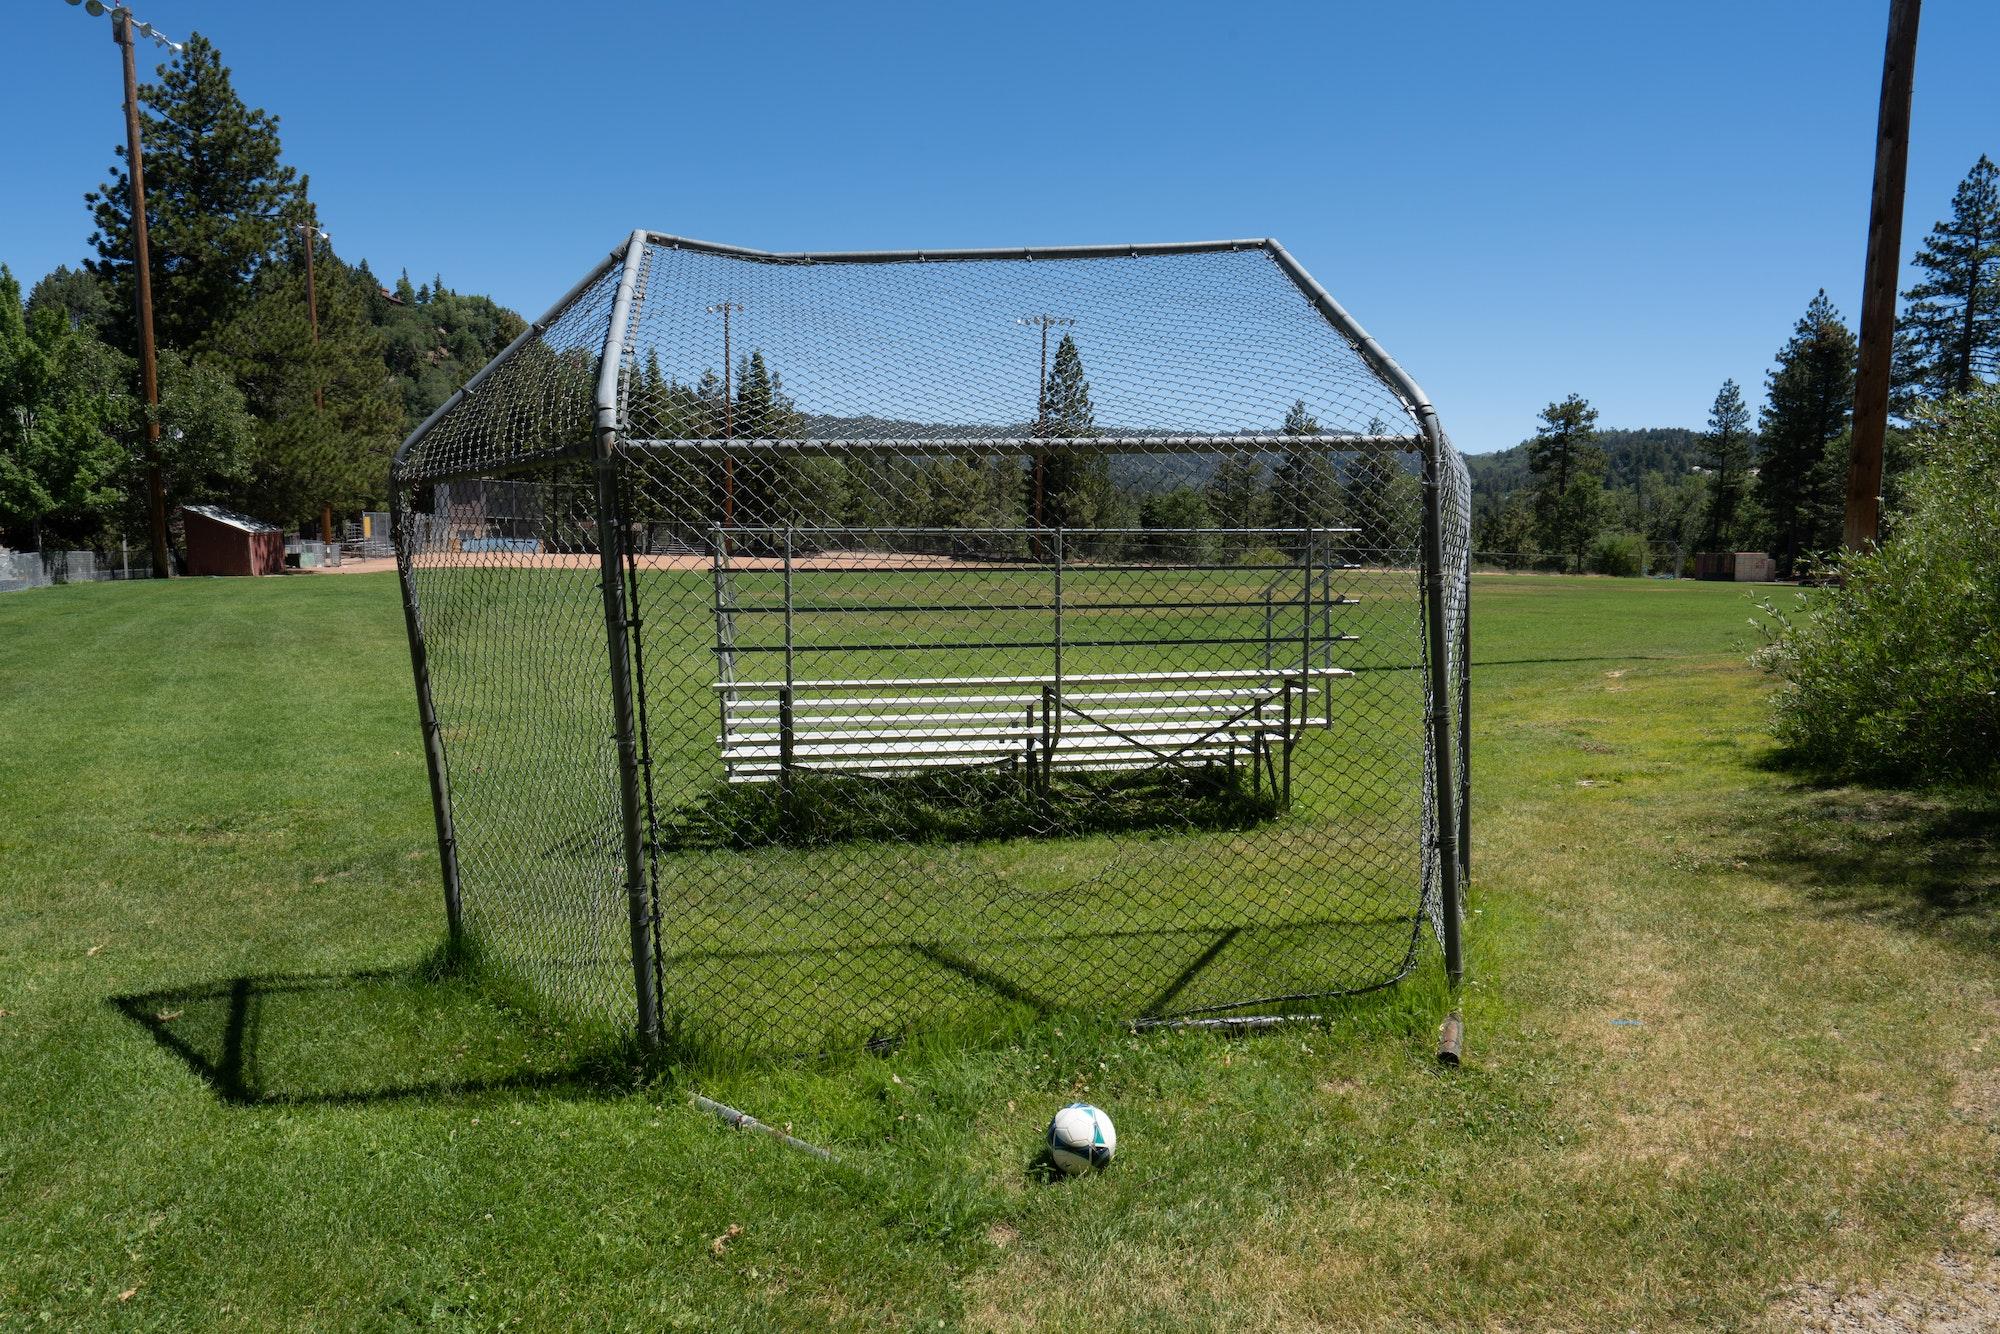 Running Springs Ball Field and Caplinger Soccer Field